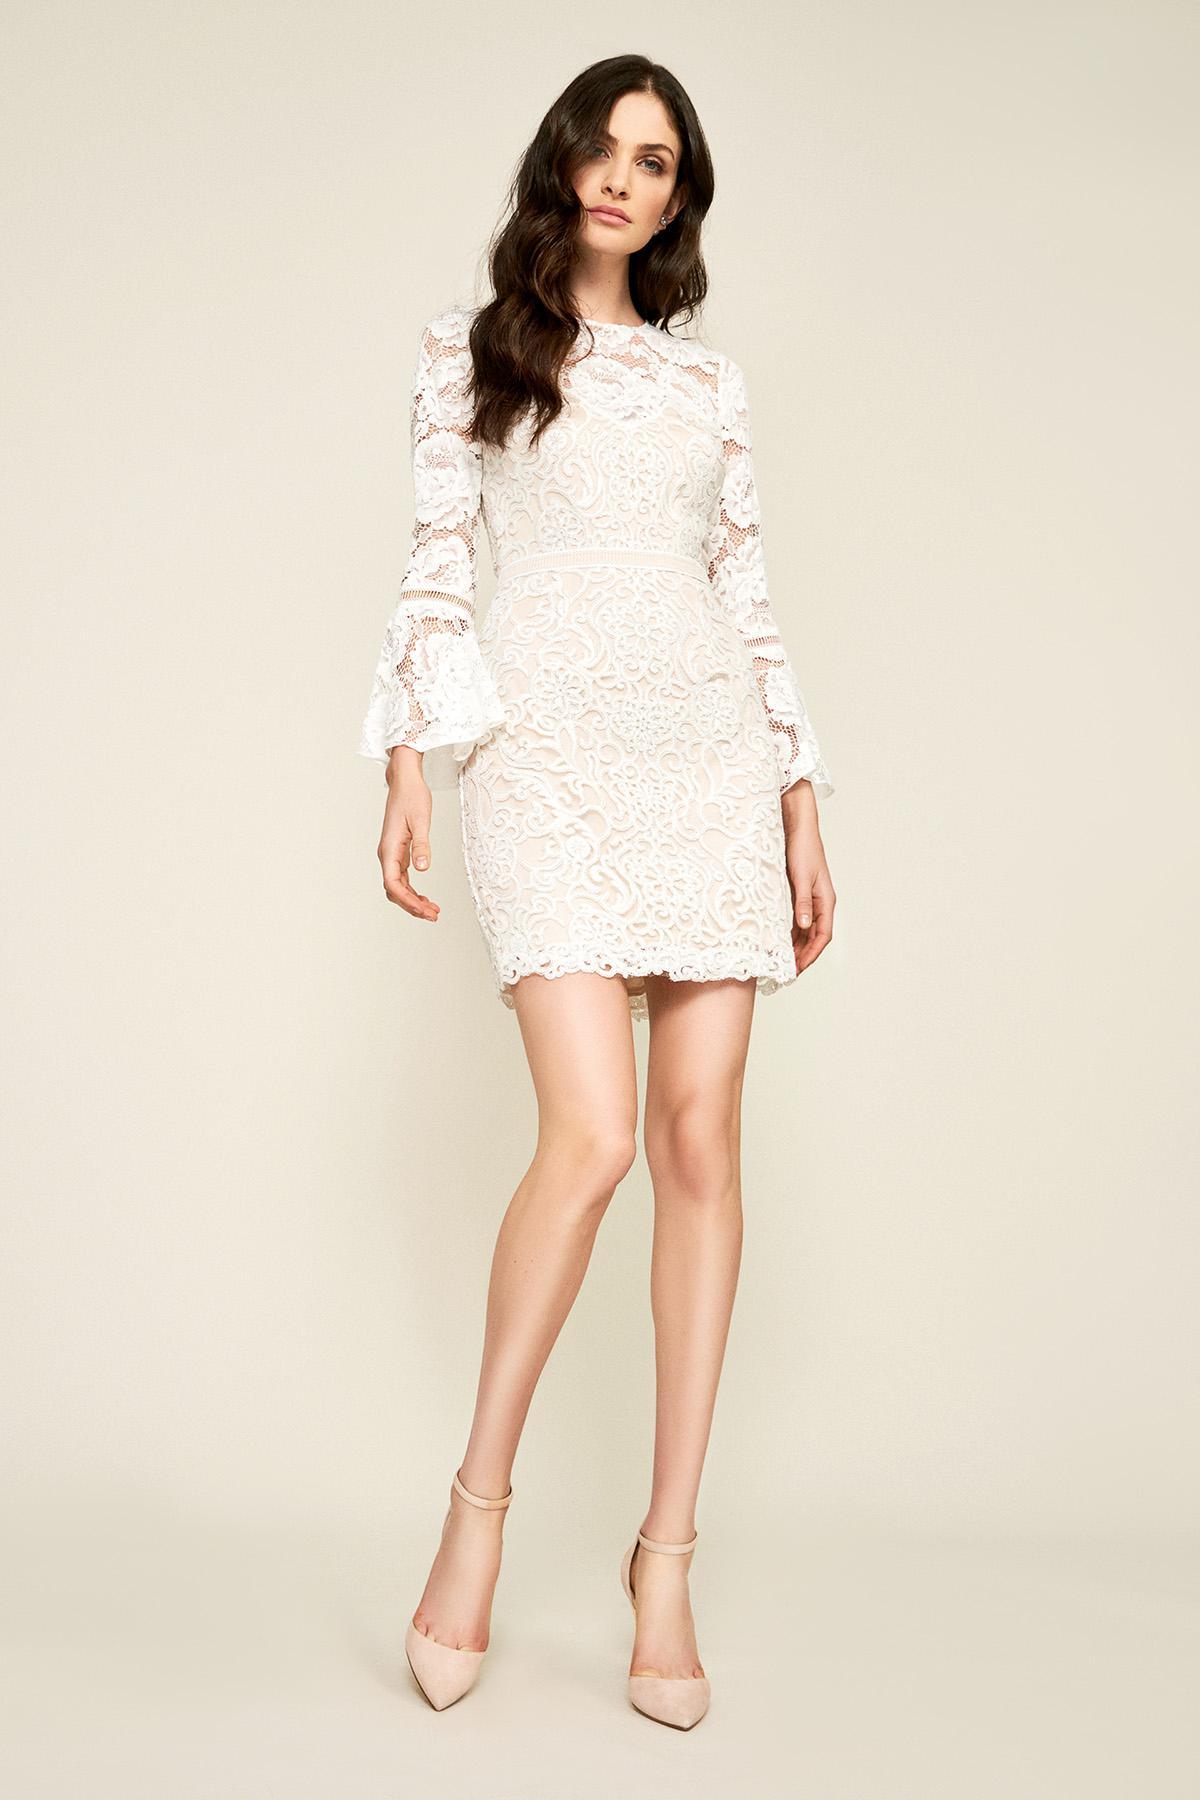 1707c23d7323 Tadashi Shoji Gabby Dress in White - Lyst